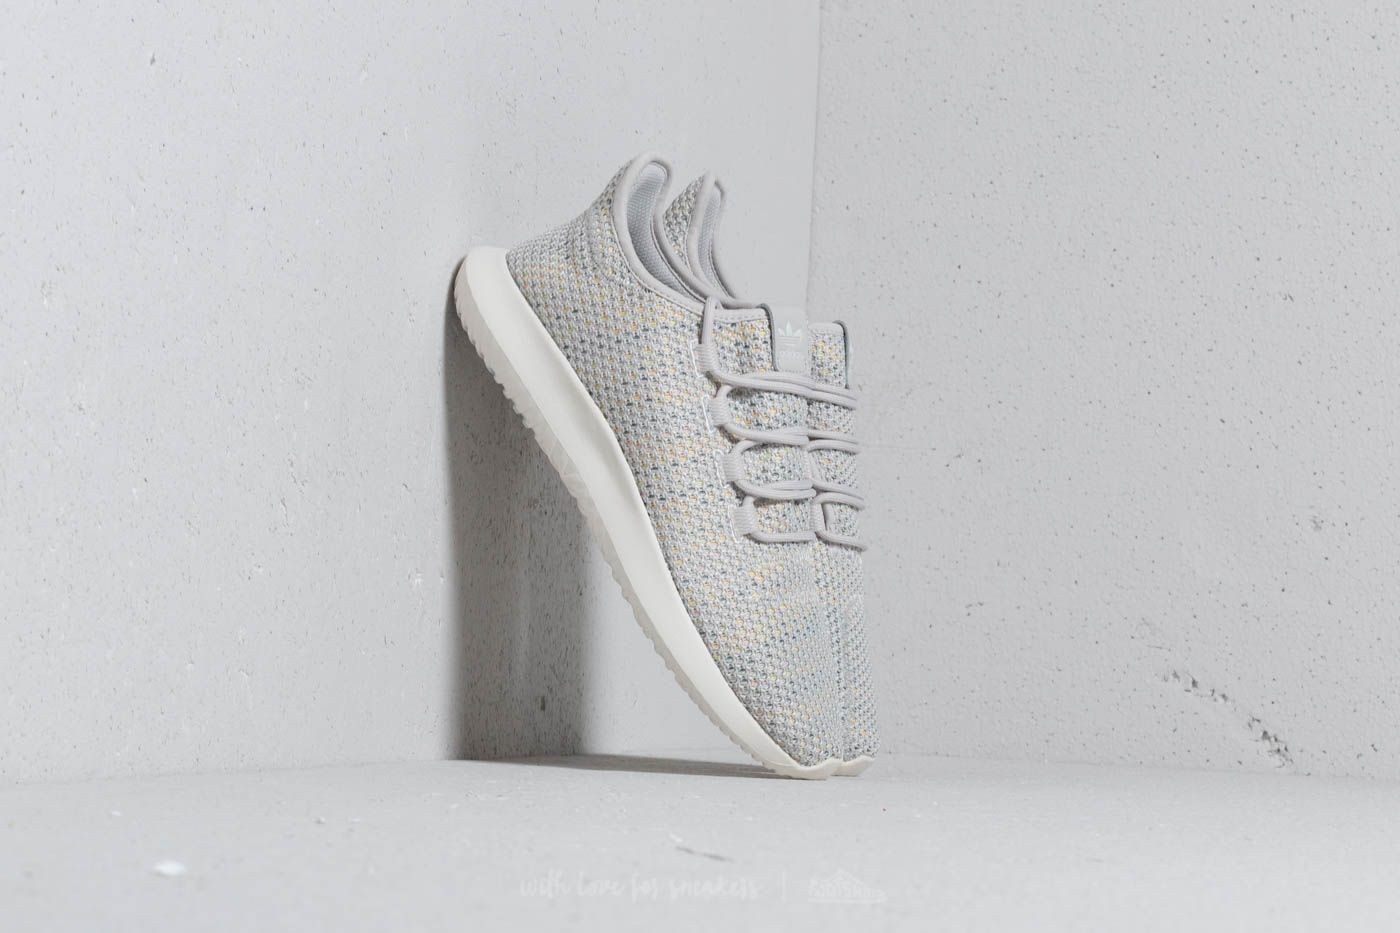 adidas Tubular Shadow CK Grey One/ Cloud White/ Raw Green za skvělou cenu 1 890 Kč koupíte na Footshop.cz